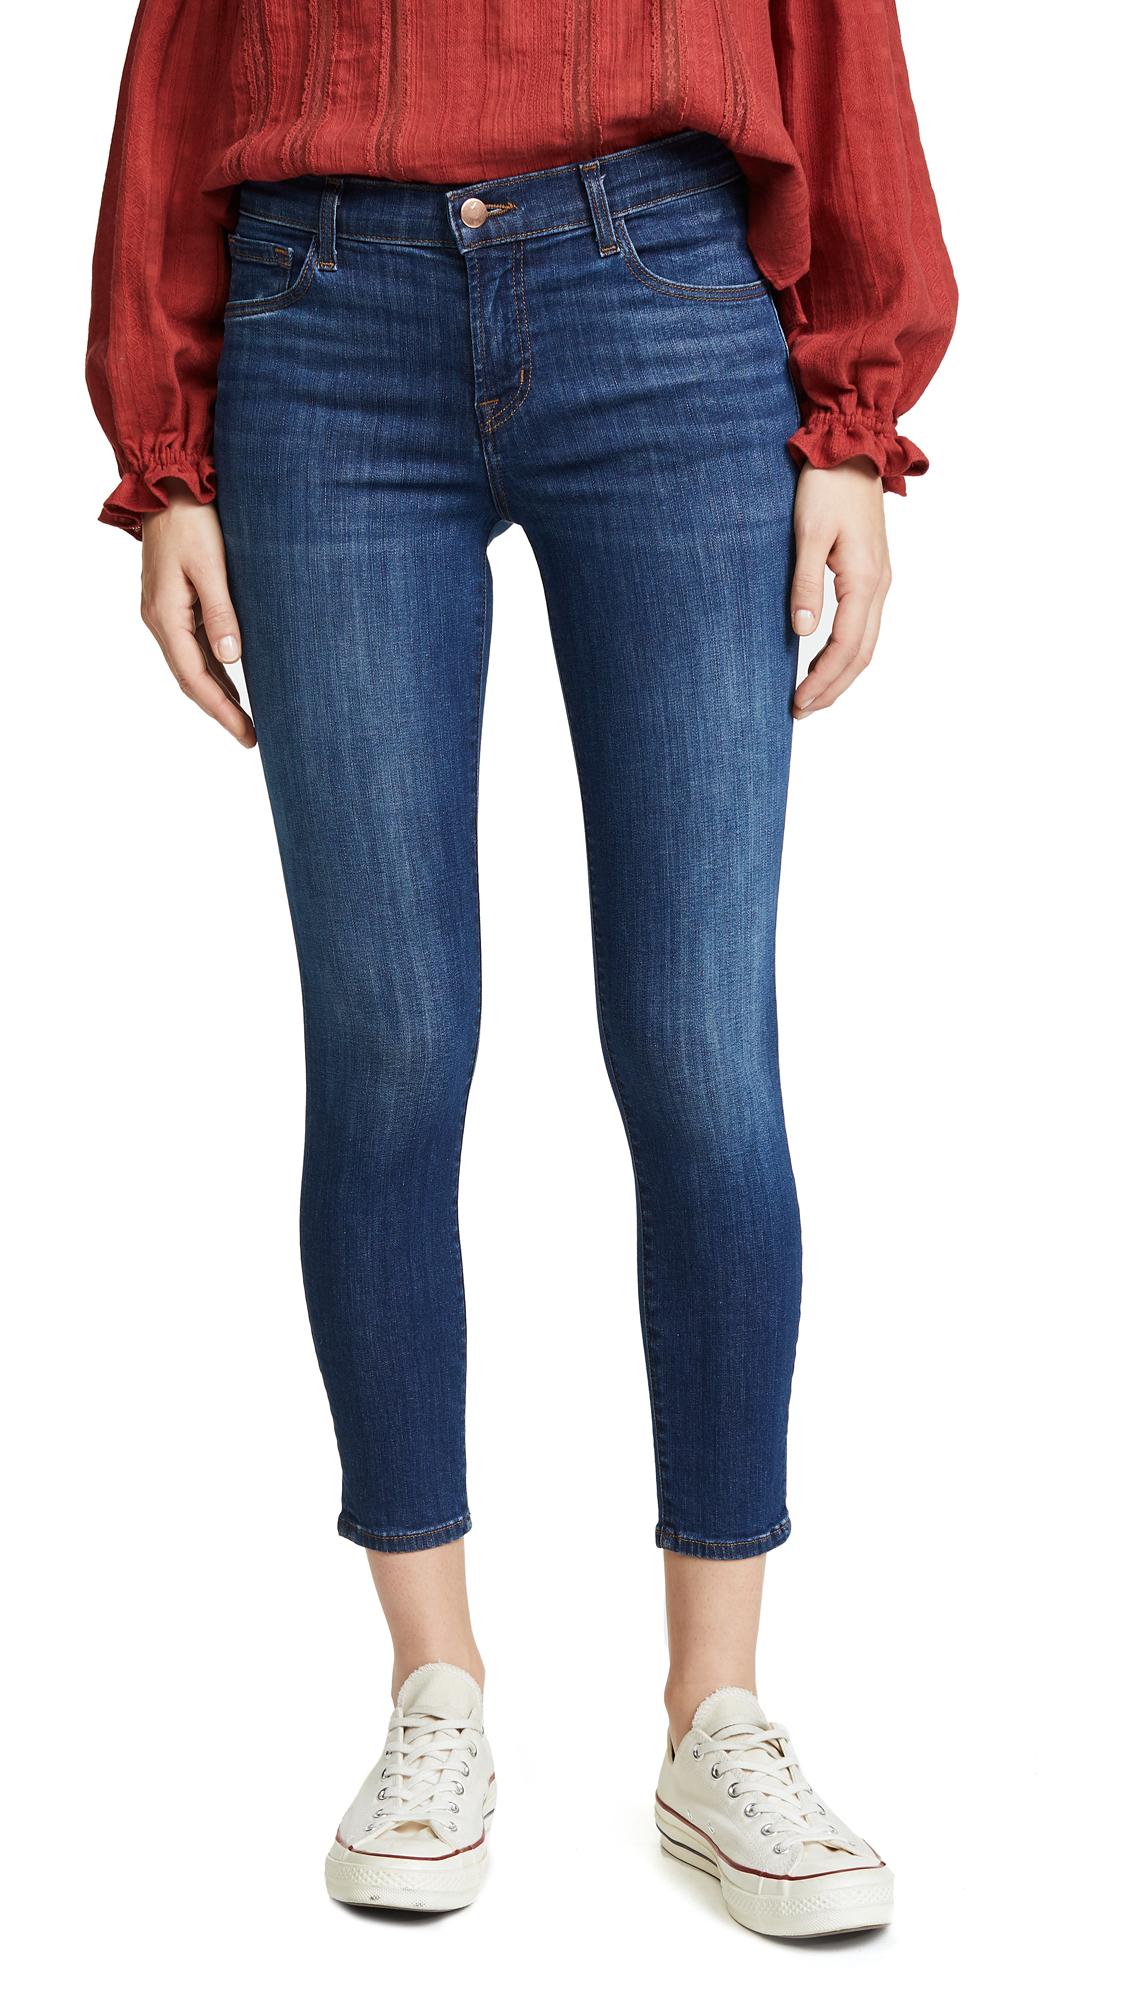 J Brand 835 Cropped Jeans